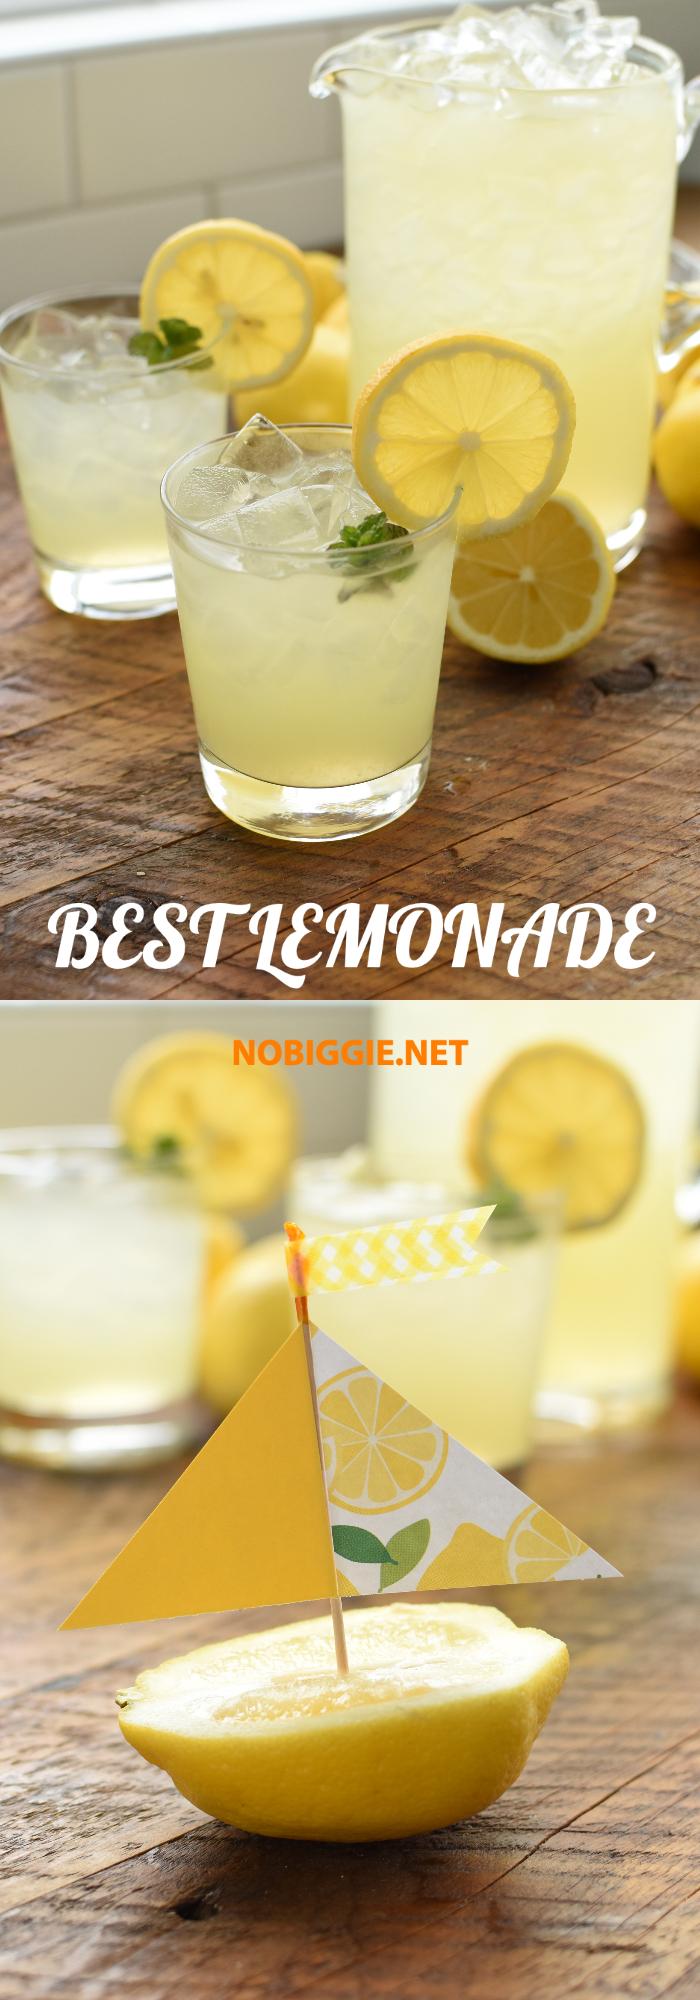 Best Lemonade recipe | NoBiggie.net